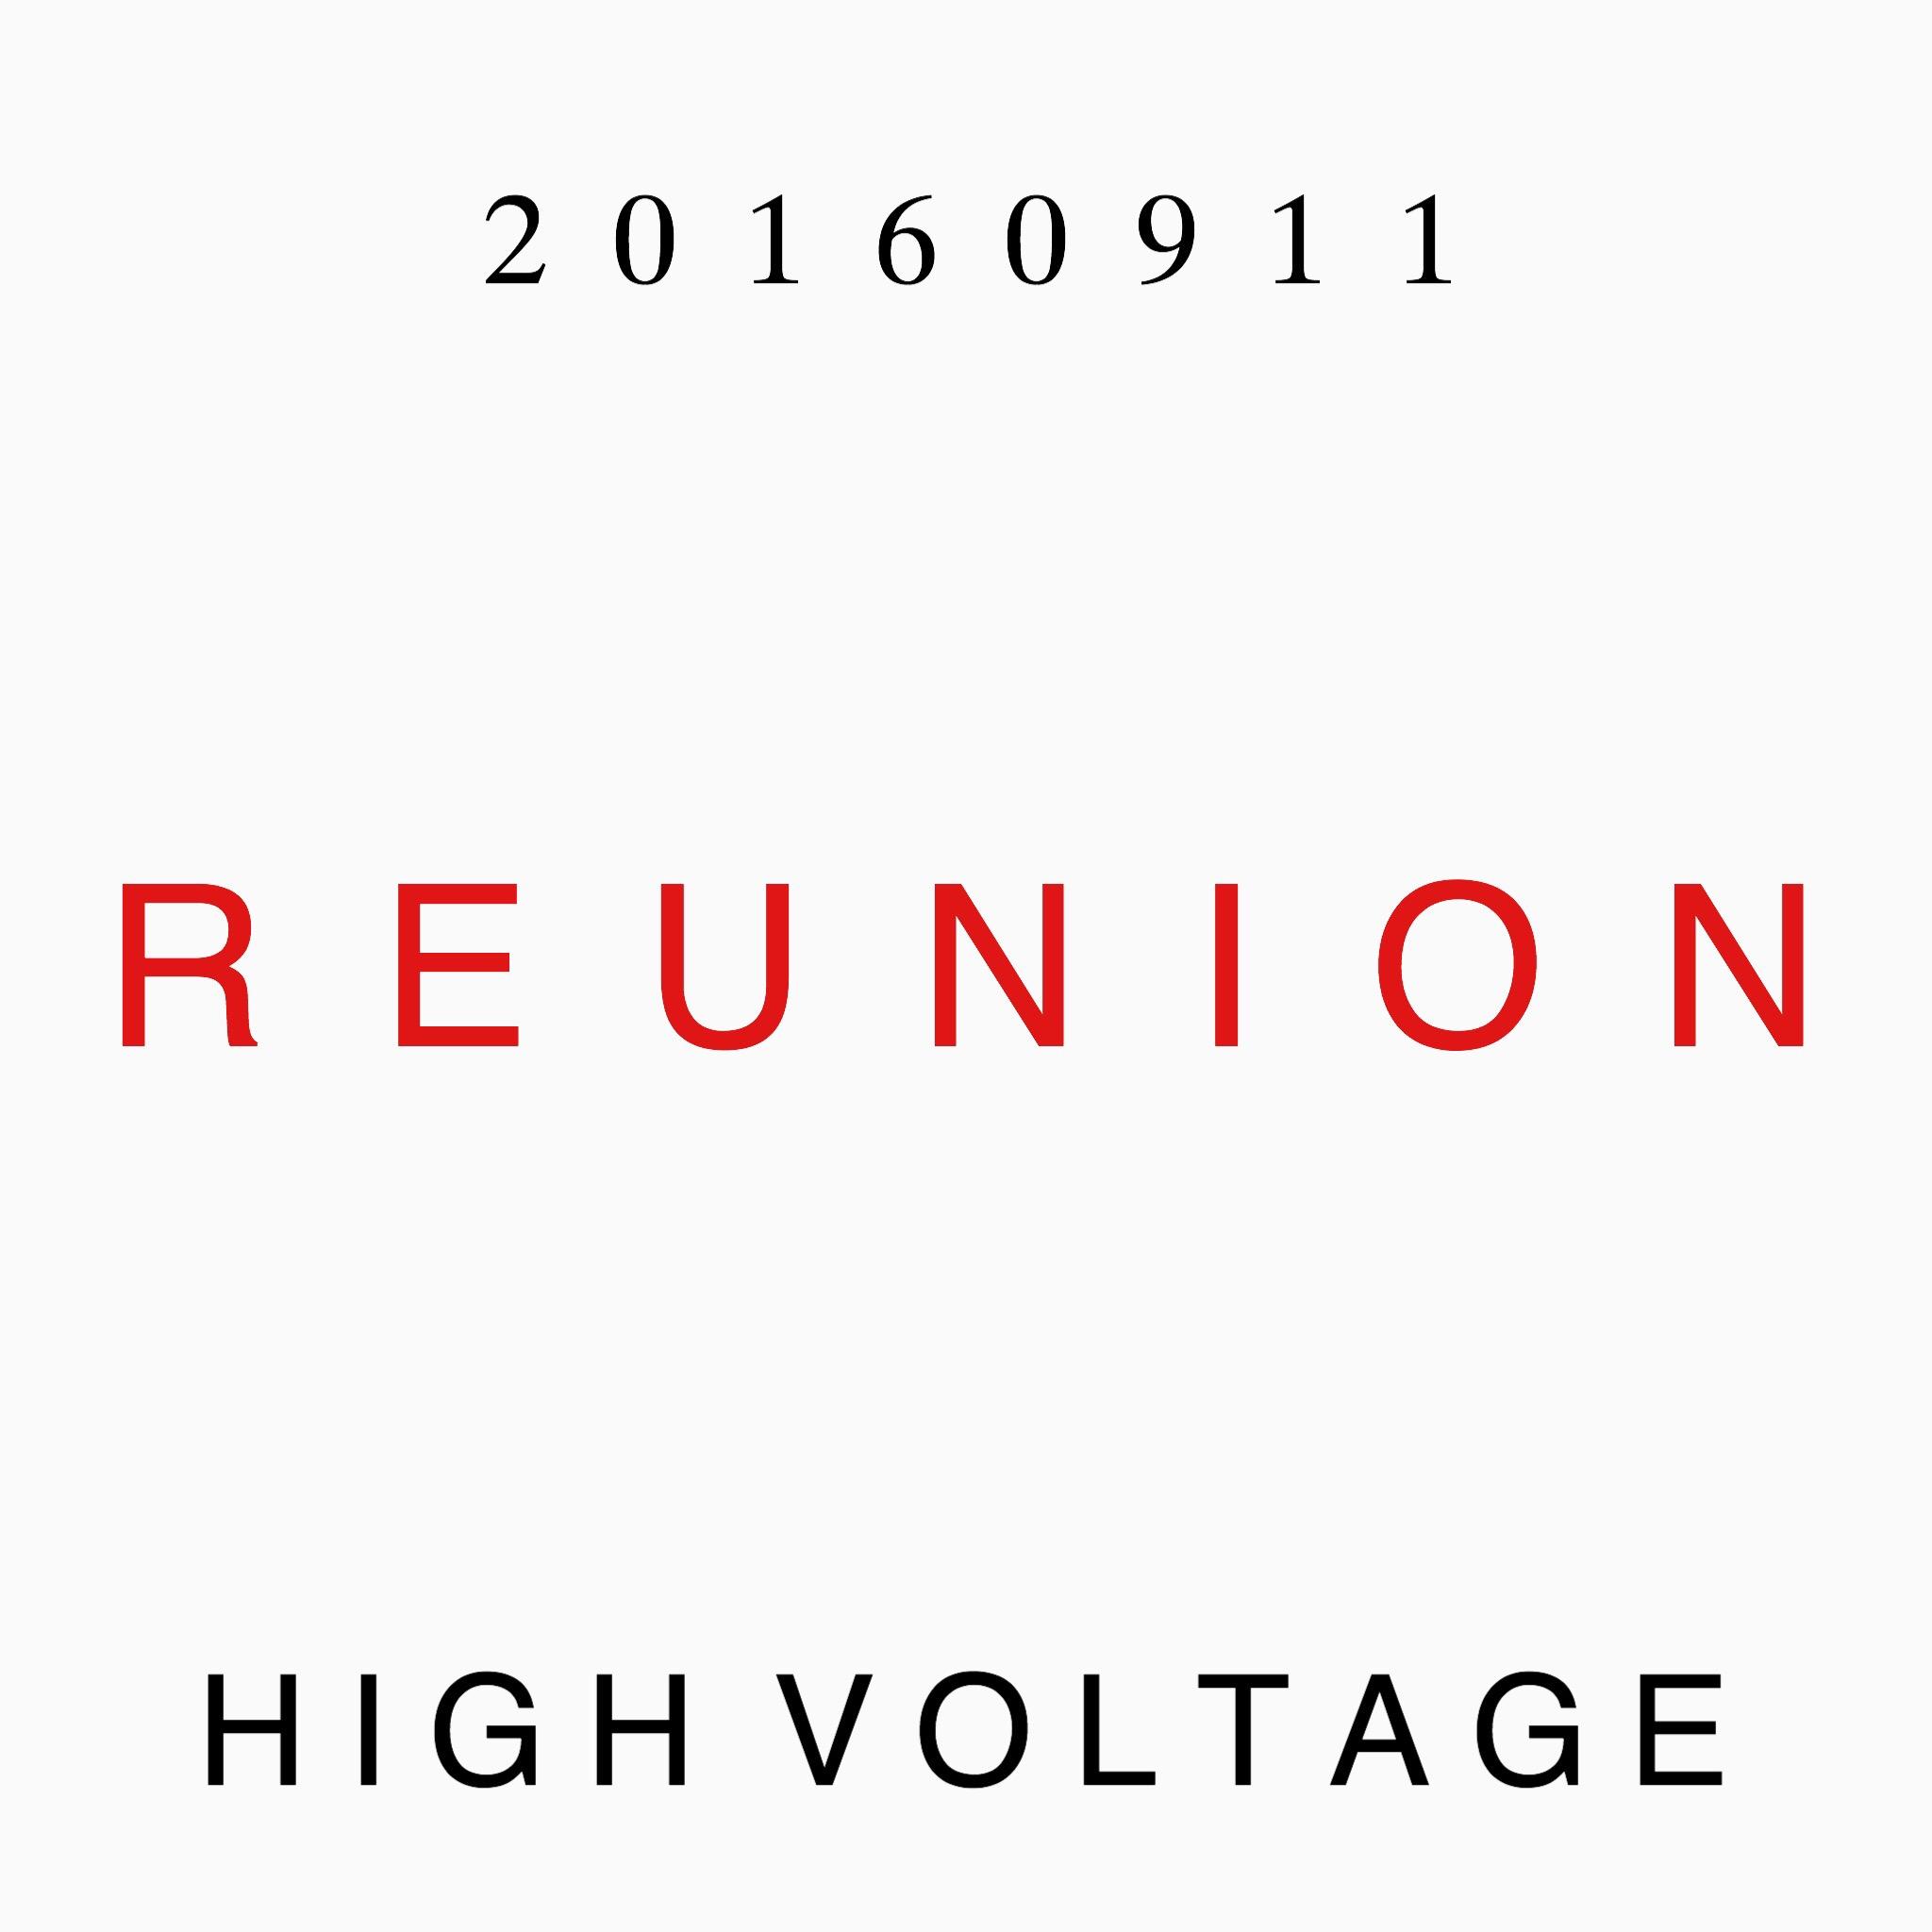 HIGH VOLTAGEが約7年ぶりに再結成、9月に札幌で復活ライブも開催